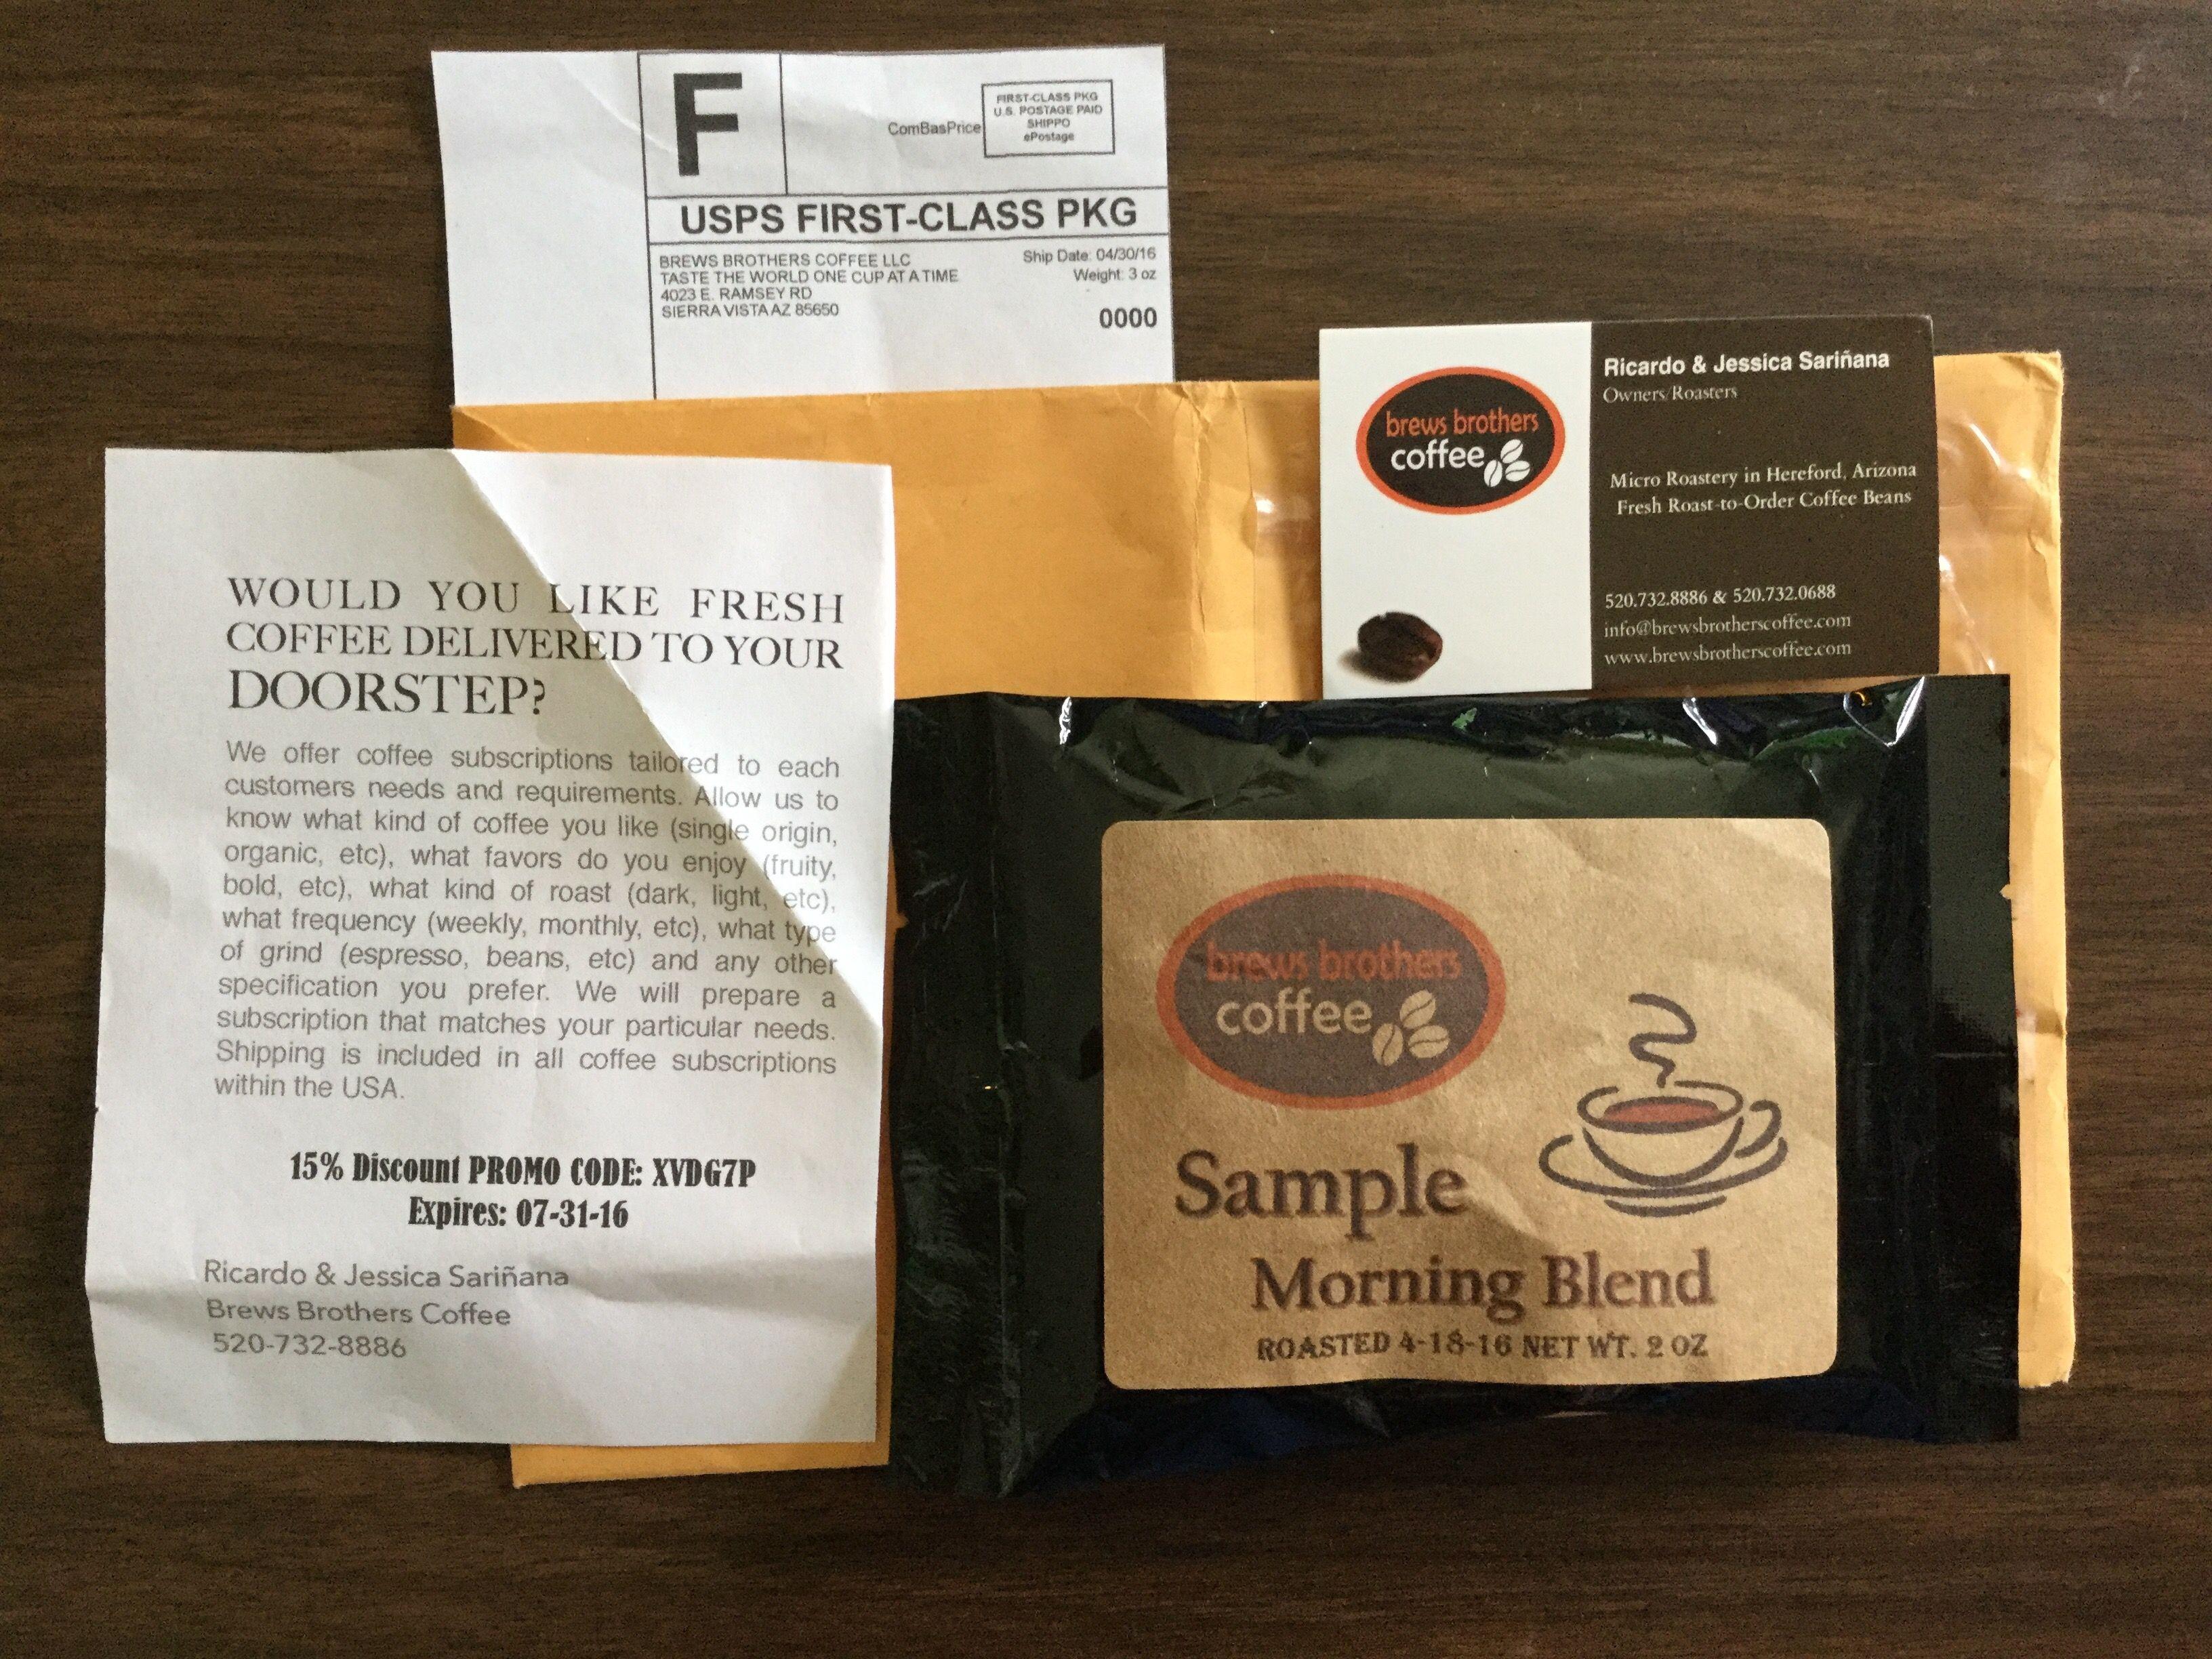 Free brews brothers coffee sample coffee samples coffee